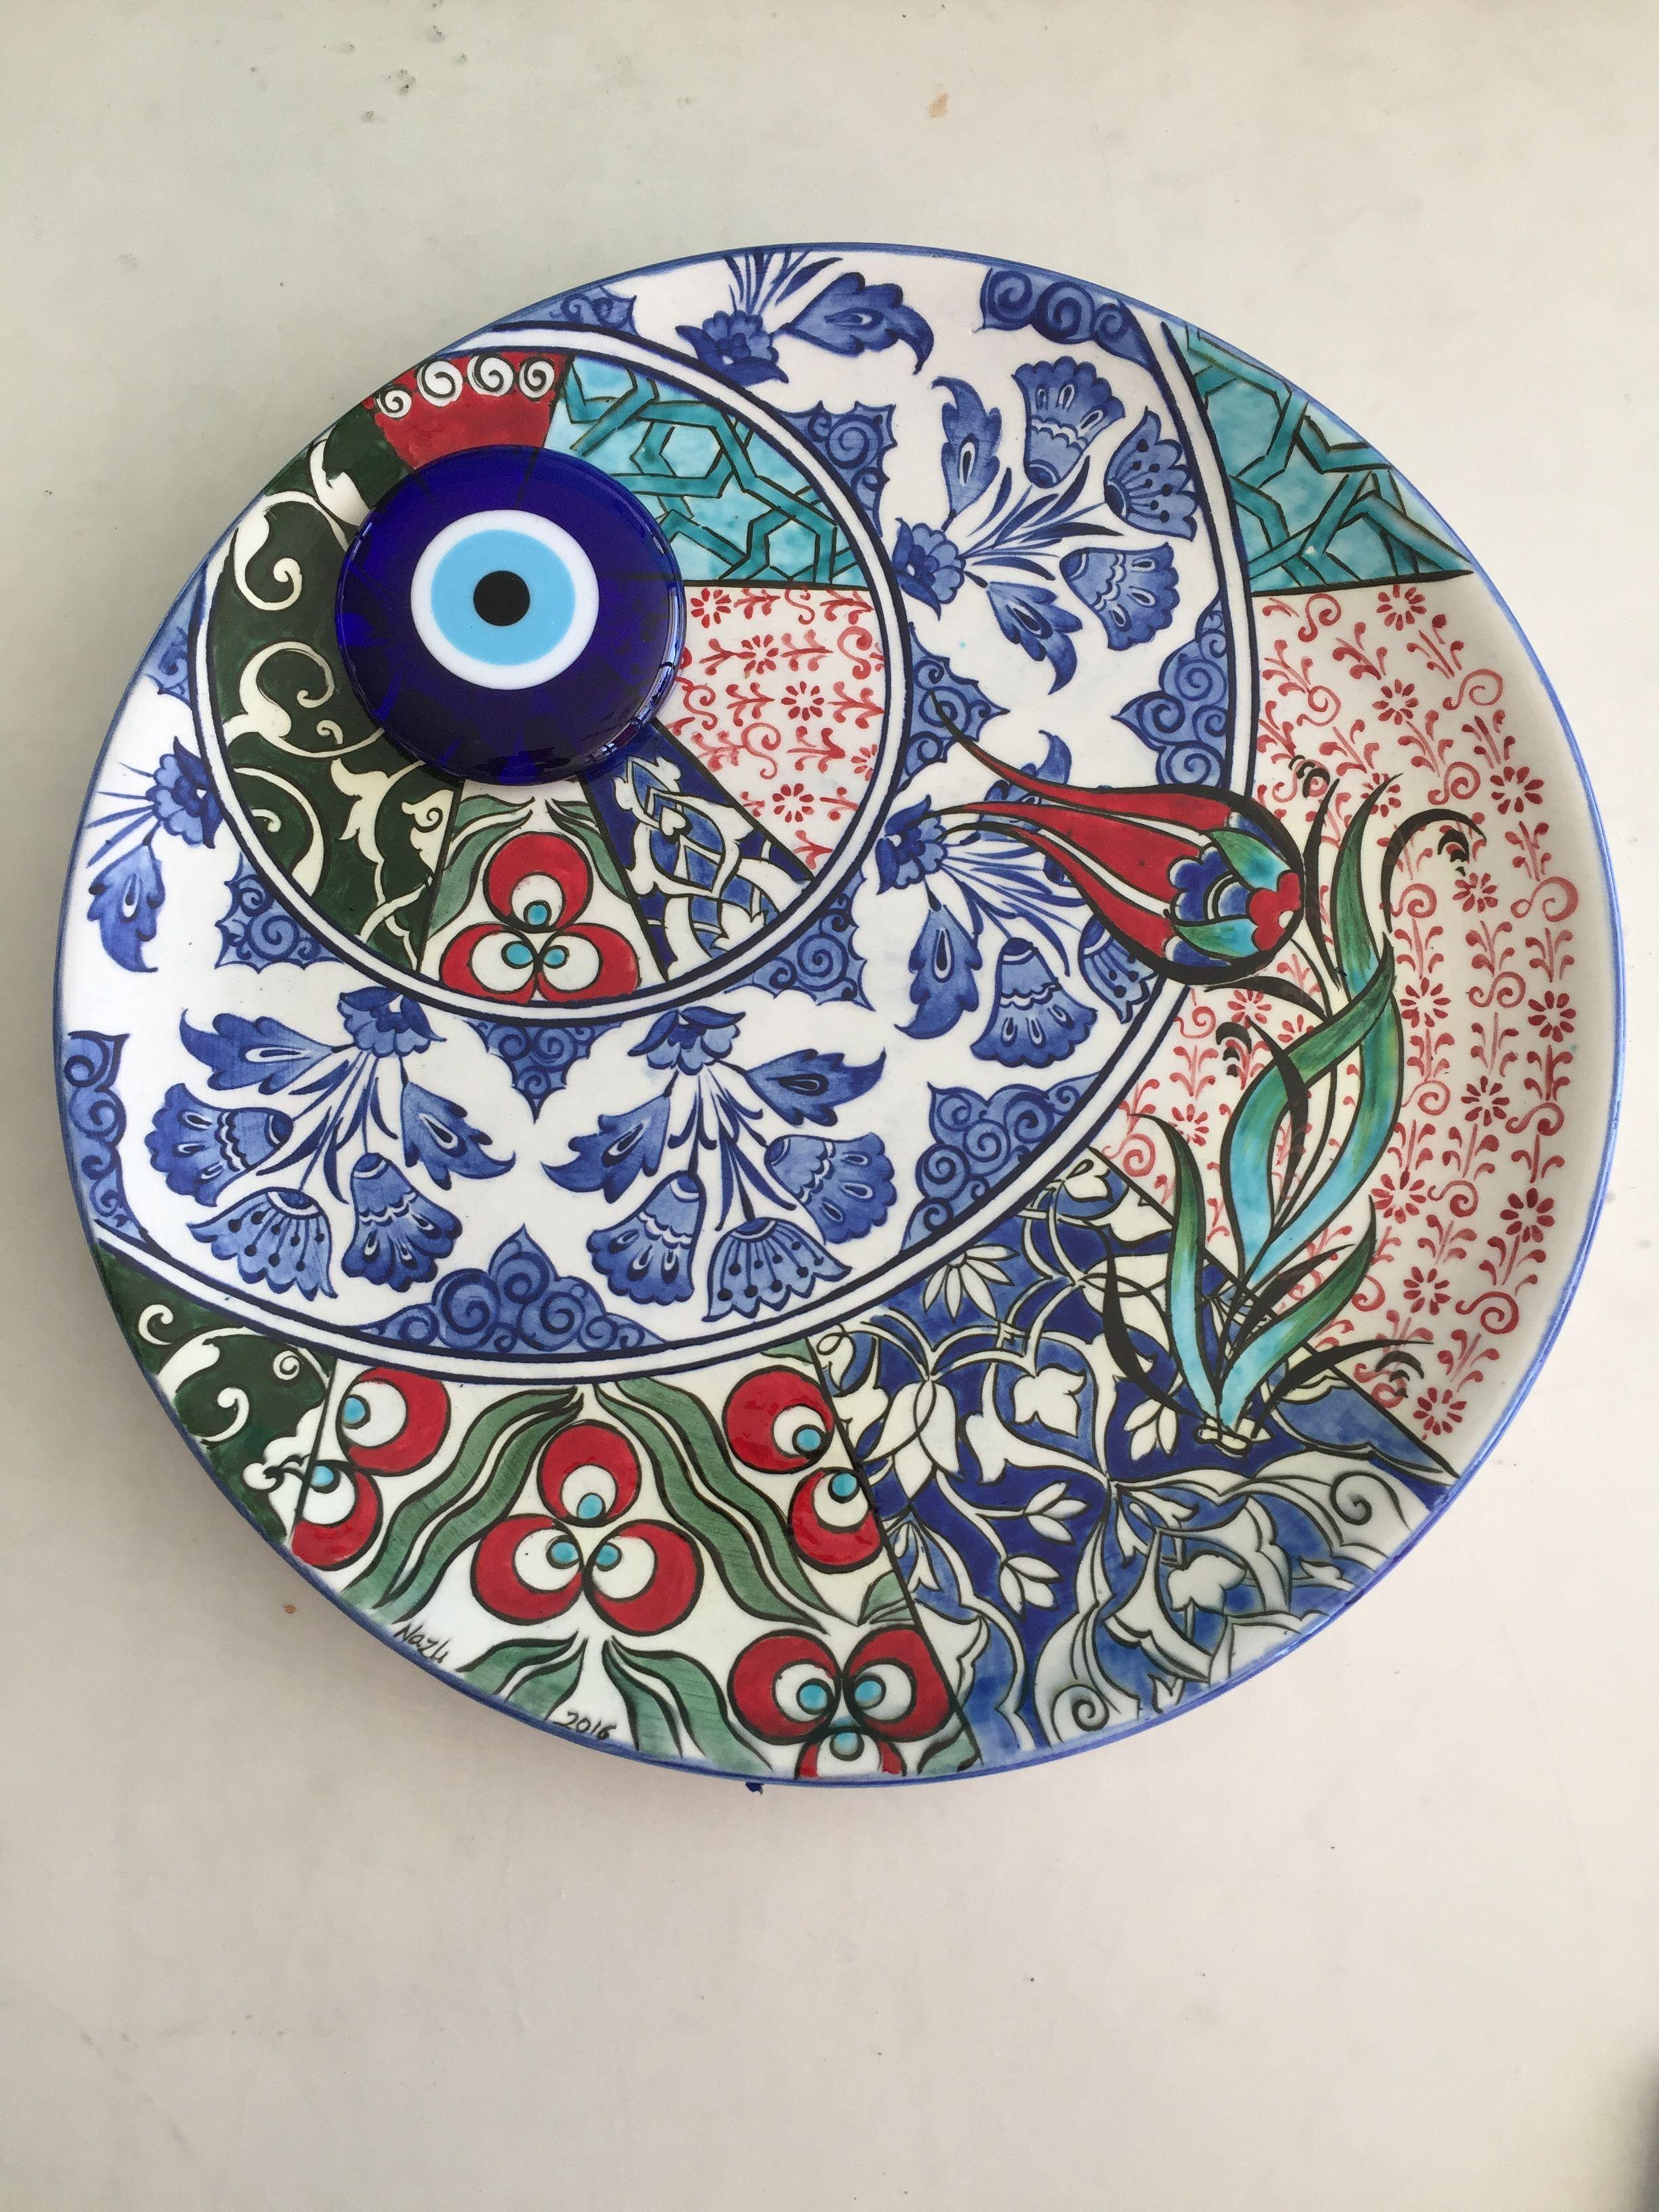 Turkish Tiles Turkish Art Tile Art Ceramic Plates Islamic Art Kaftan Dishes Bellisima Decorative Plates & Pin by Nazli Pinar YERIN on Lalenaz çini ve ö?renci çal??malar? ...